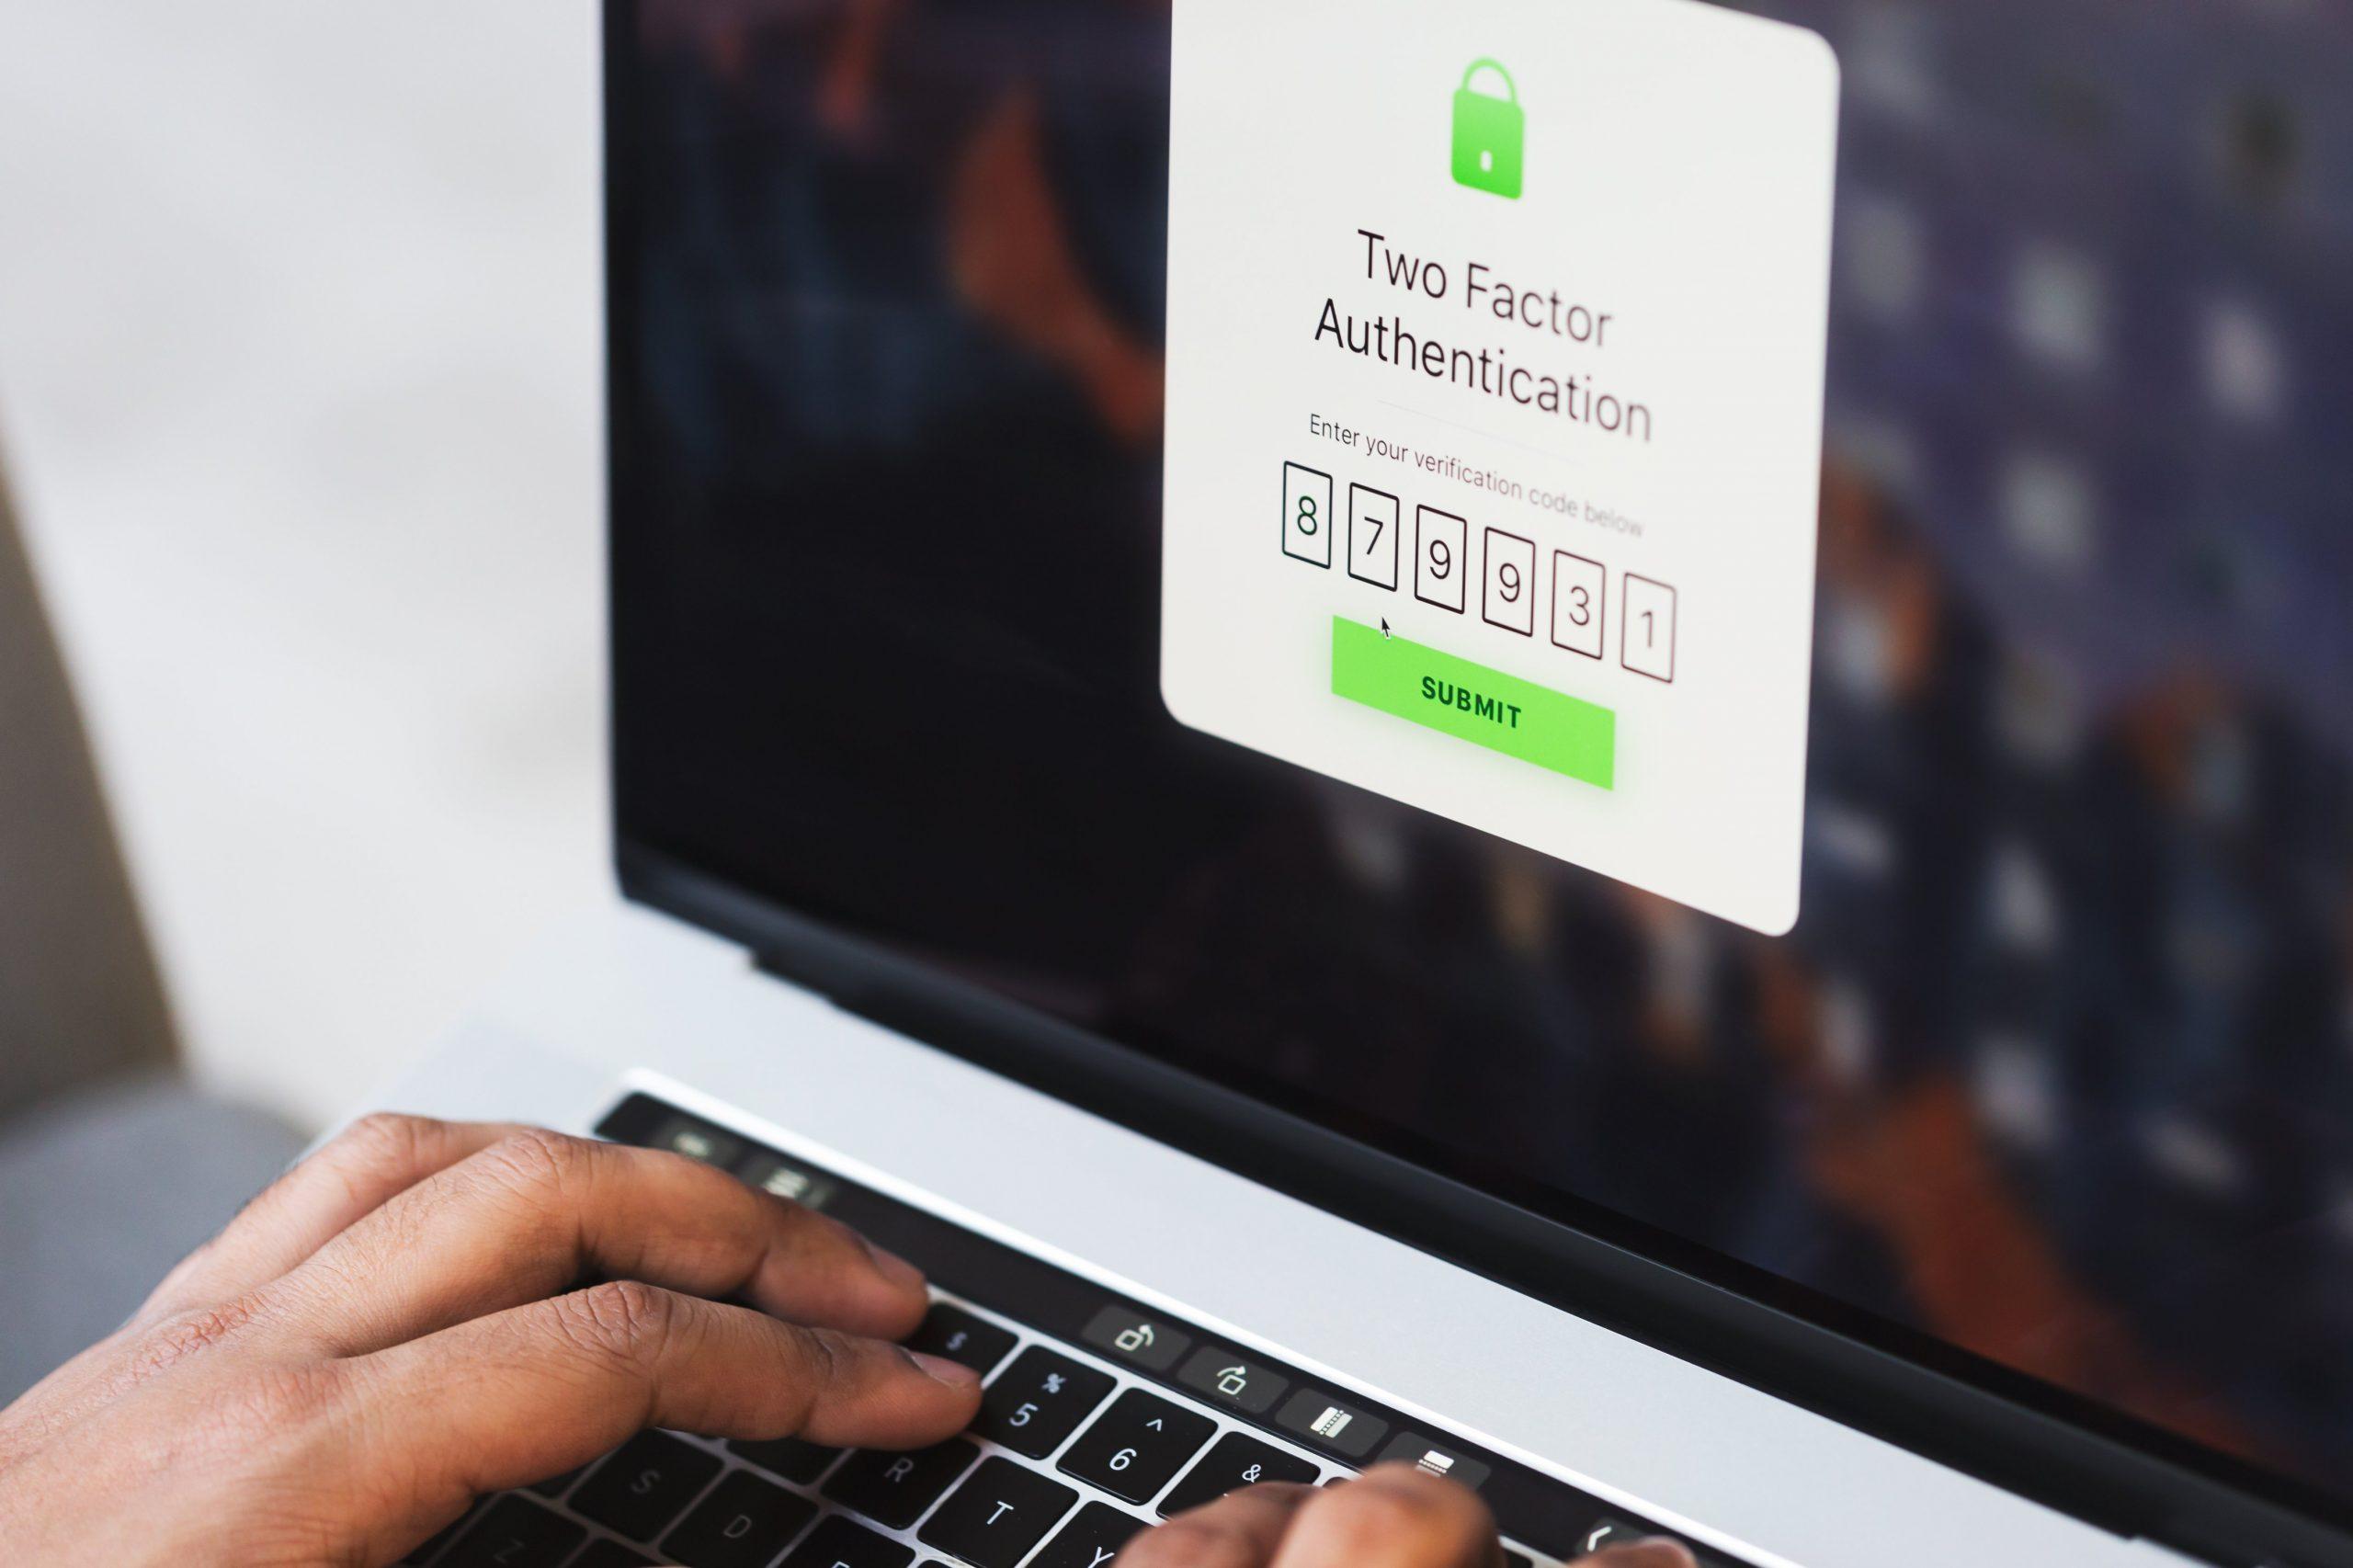 two-factor-authentication-verification-code (1)